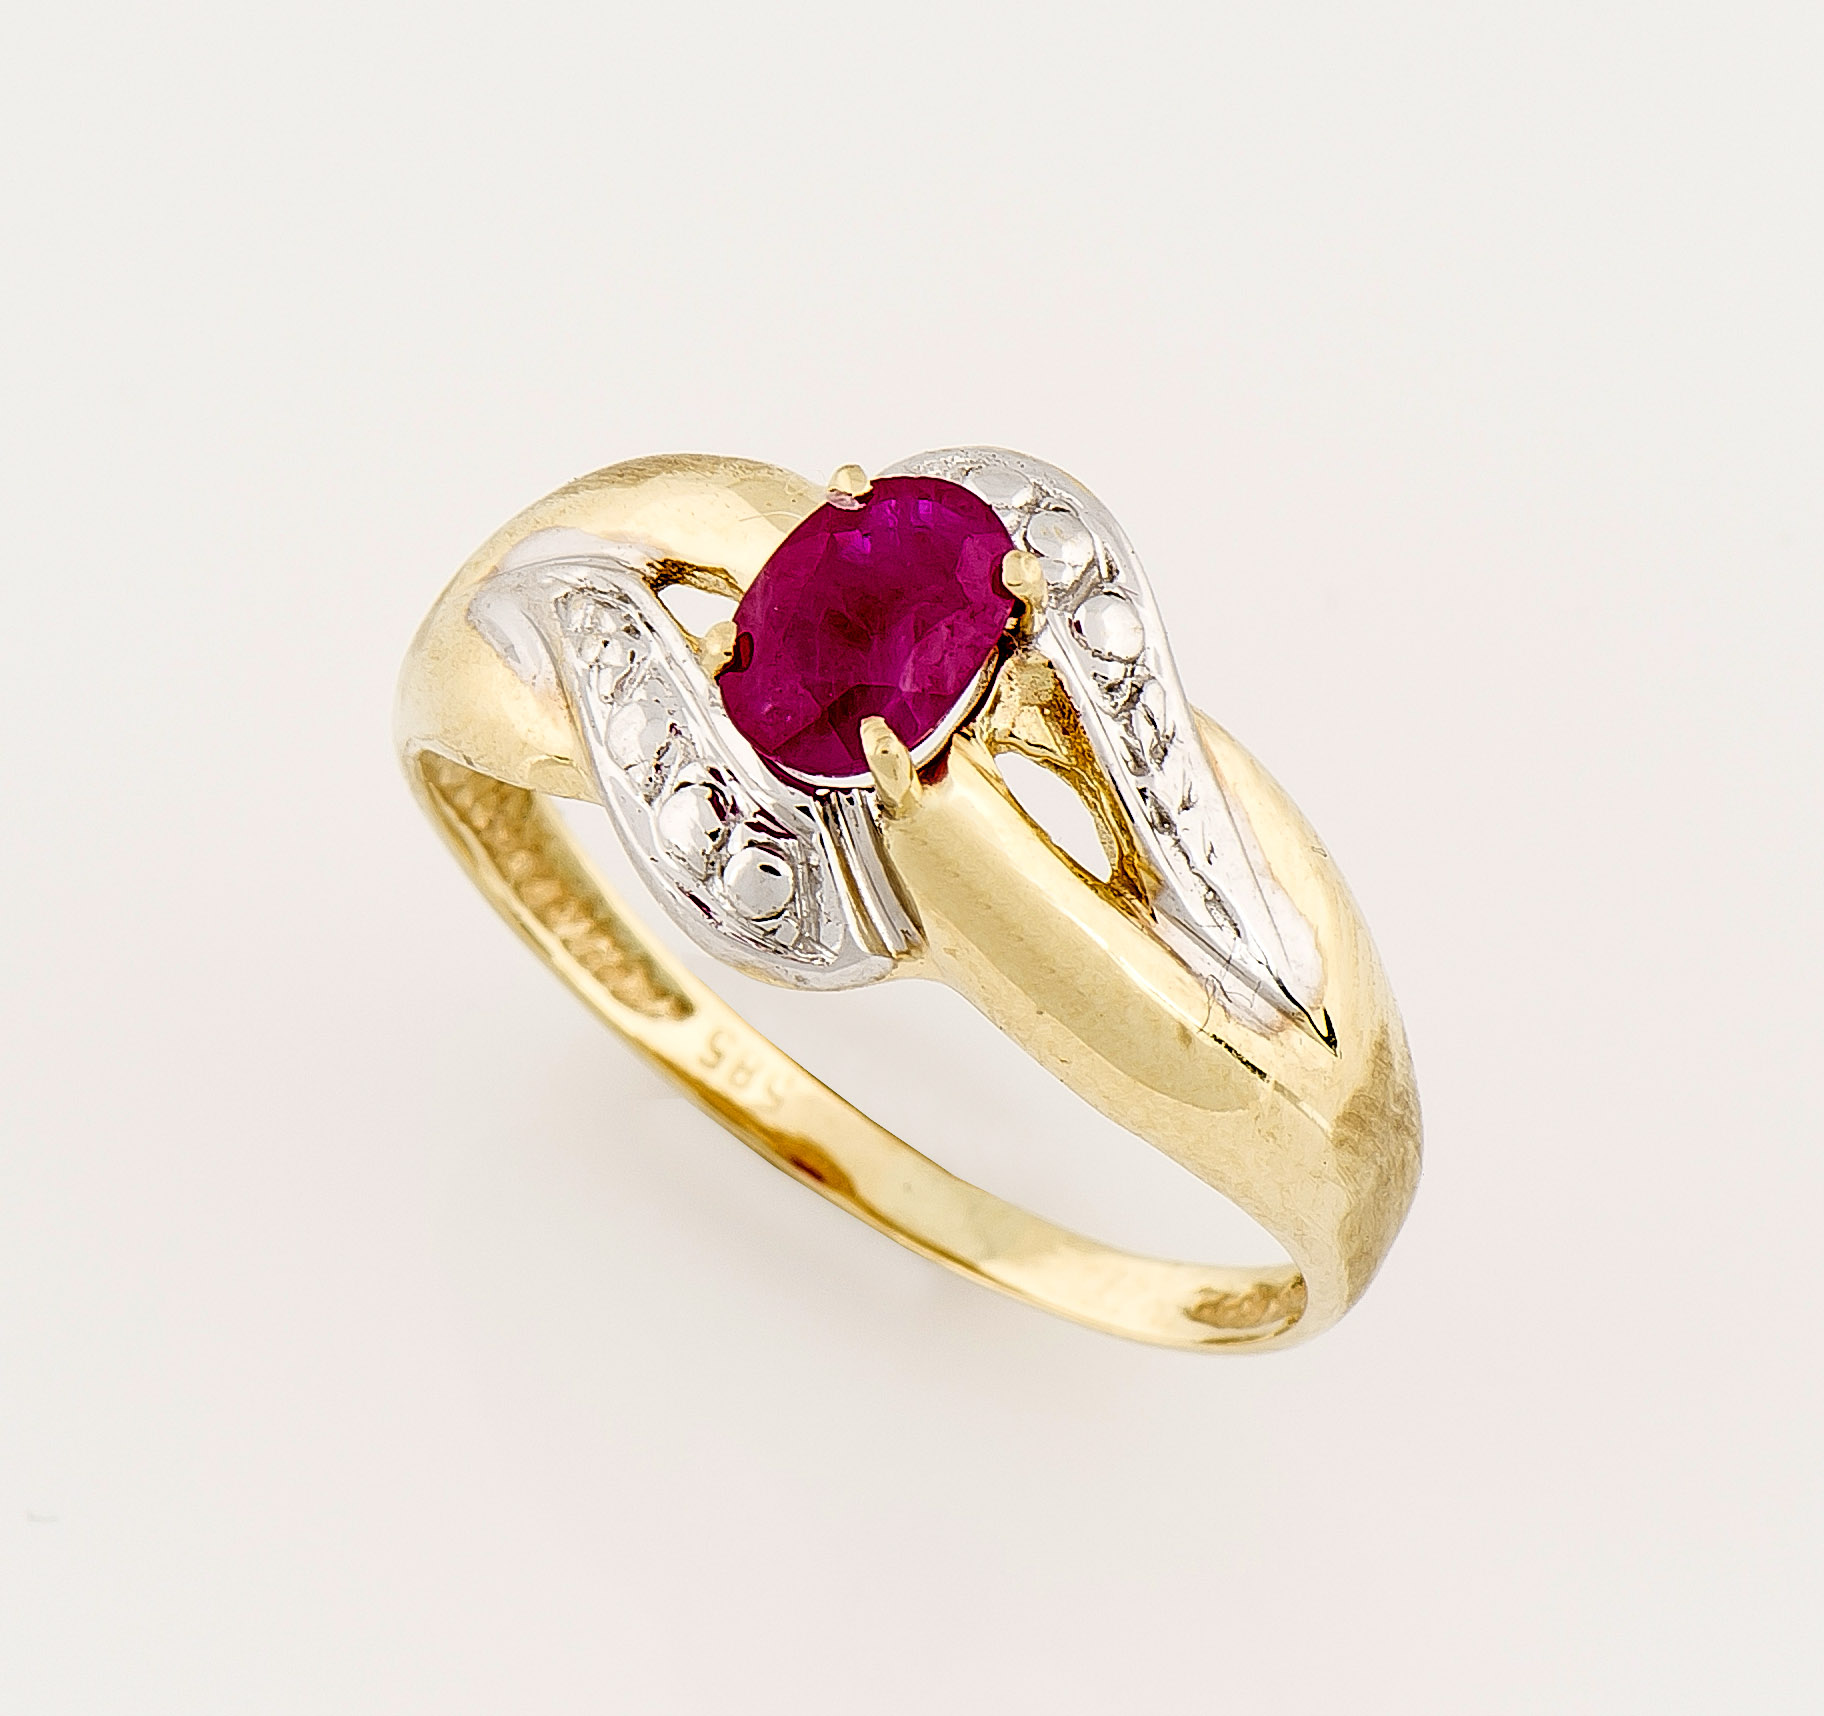 Rubin-Ring GG/WG 585/000 mit einem oval fac